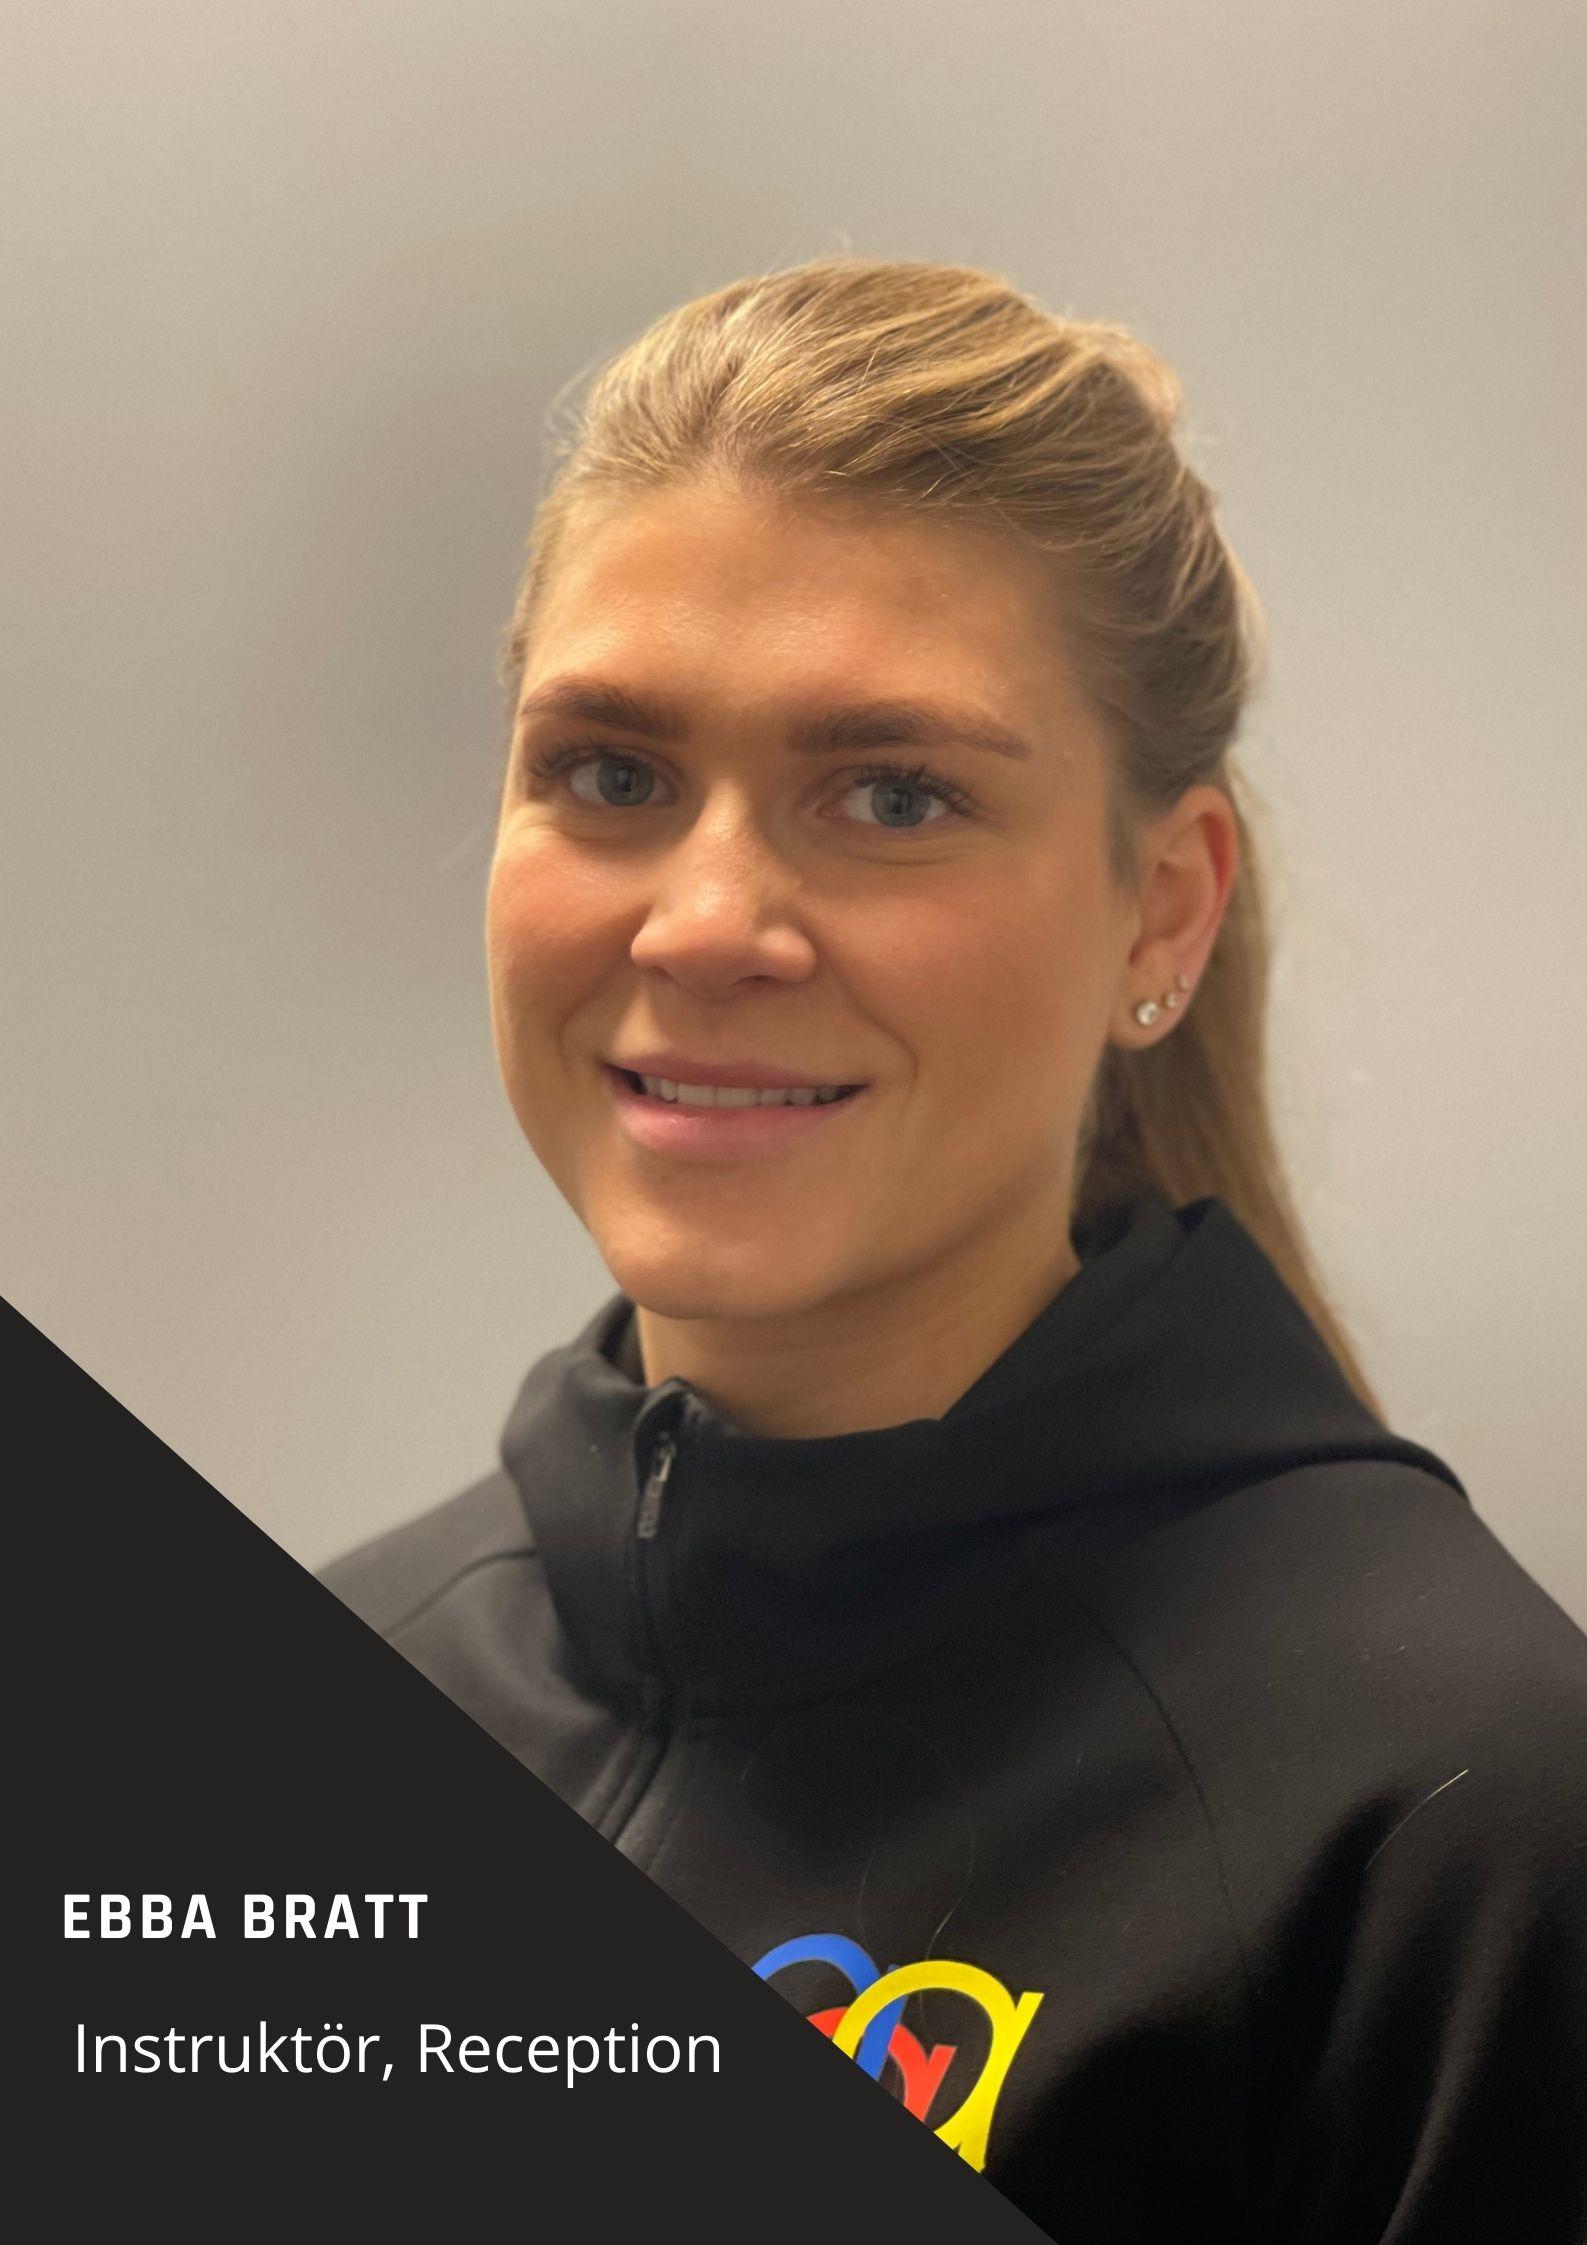 Ebba Bratt